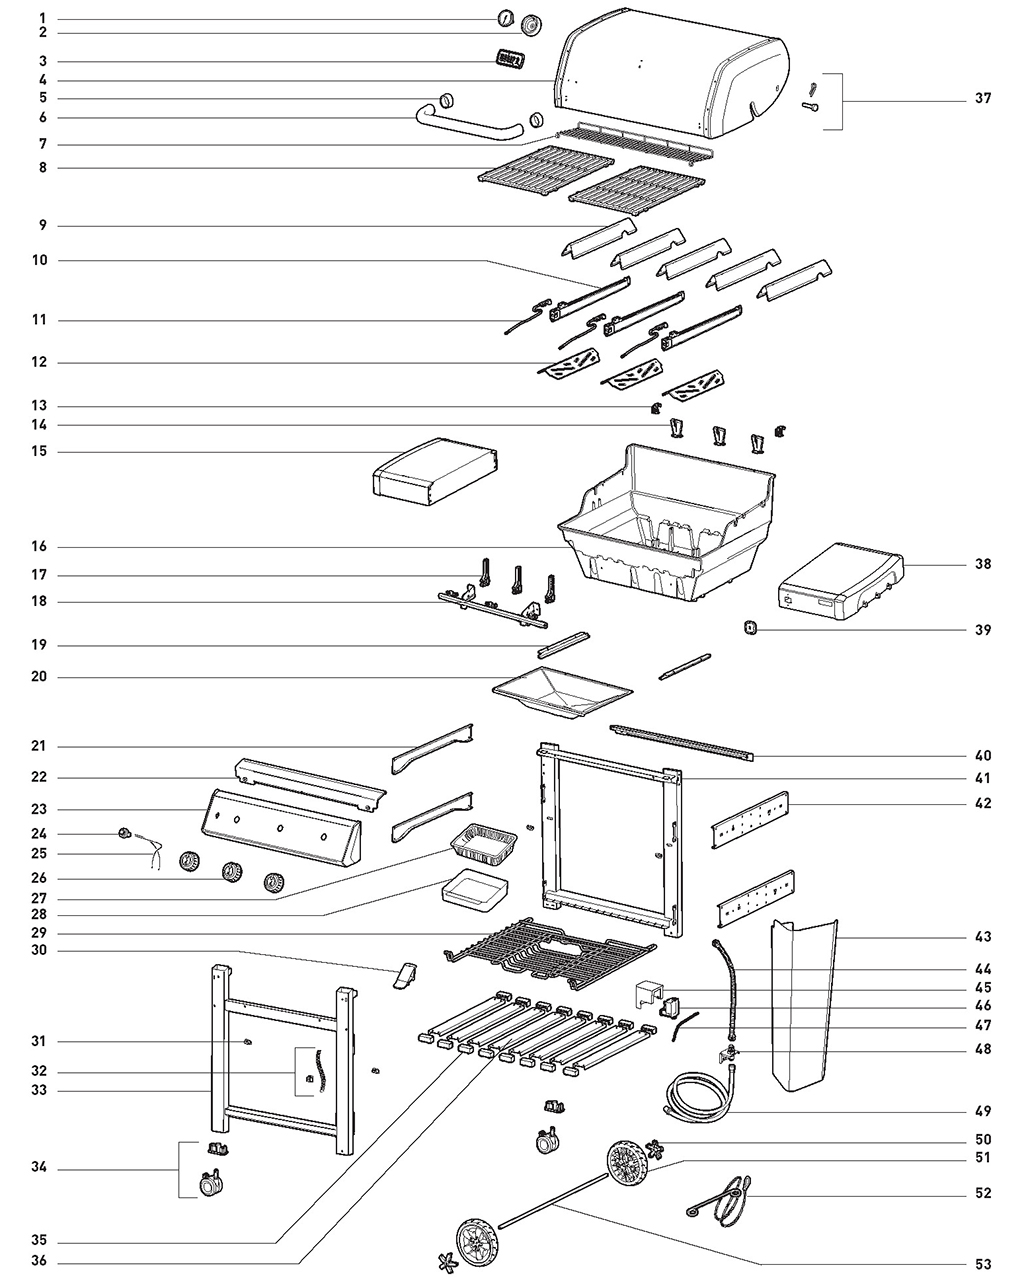 Schematic Image 66011001